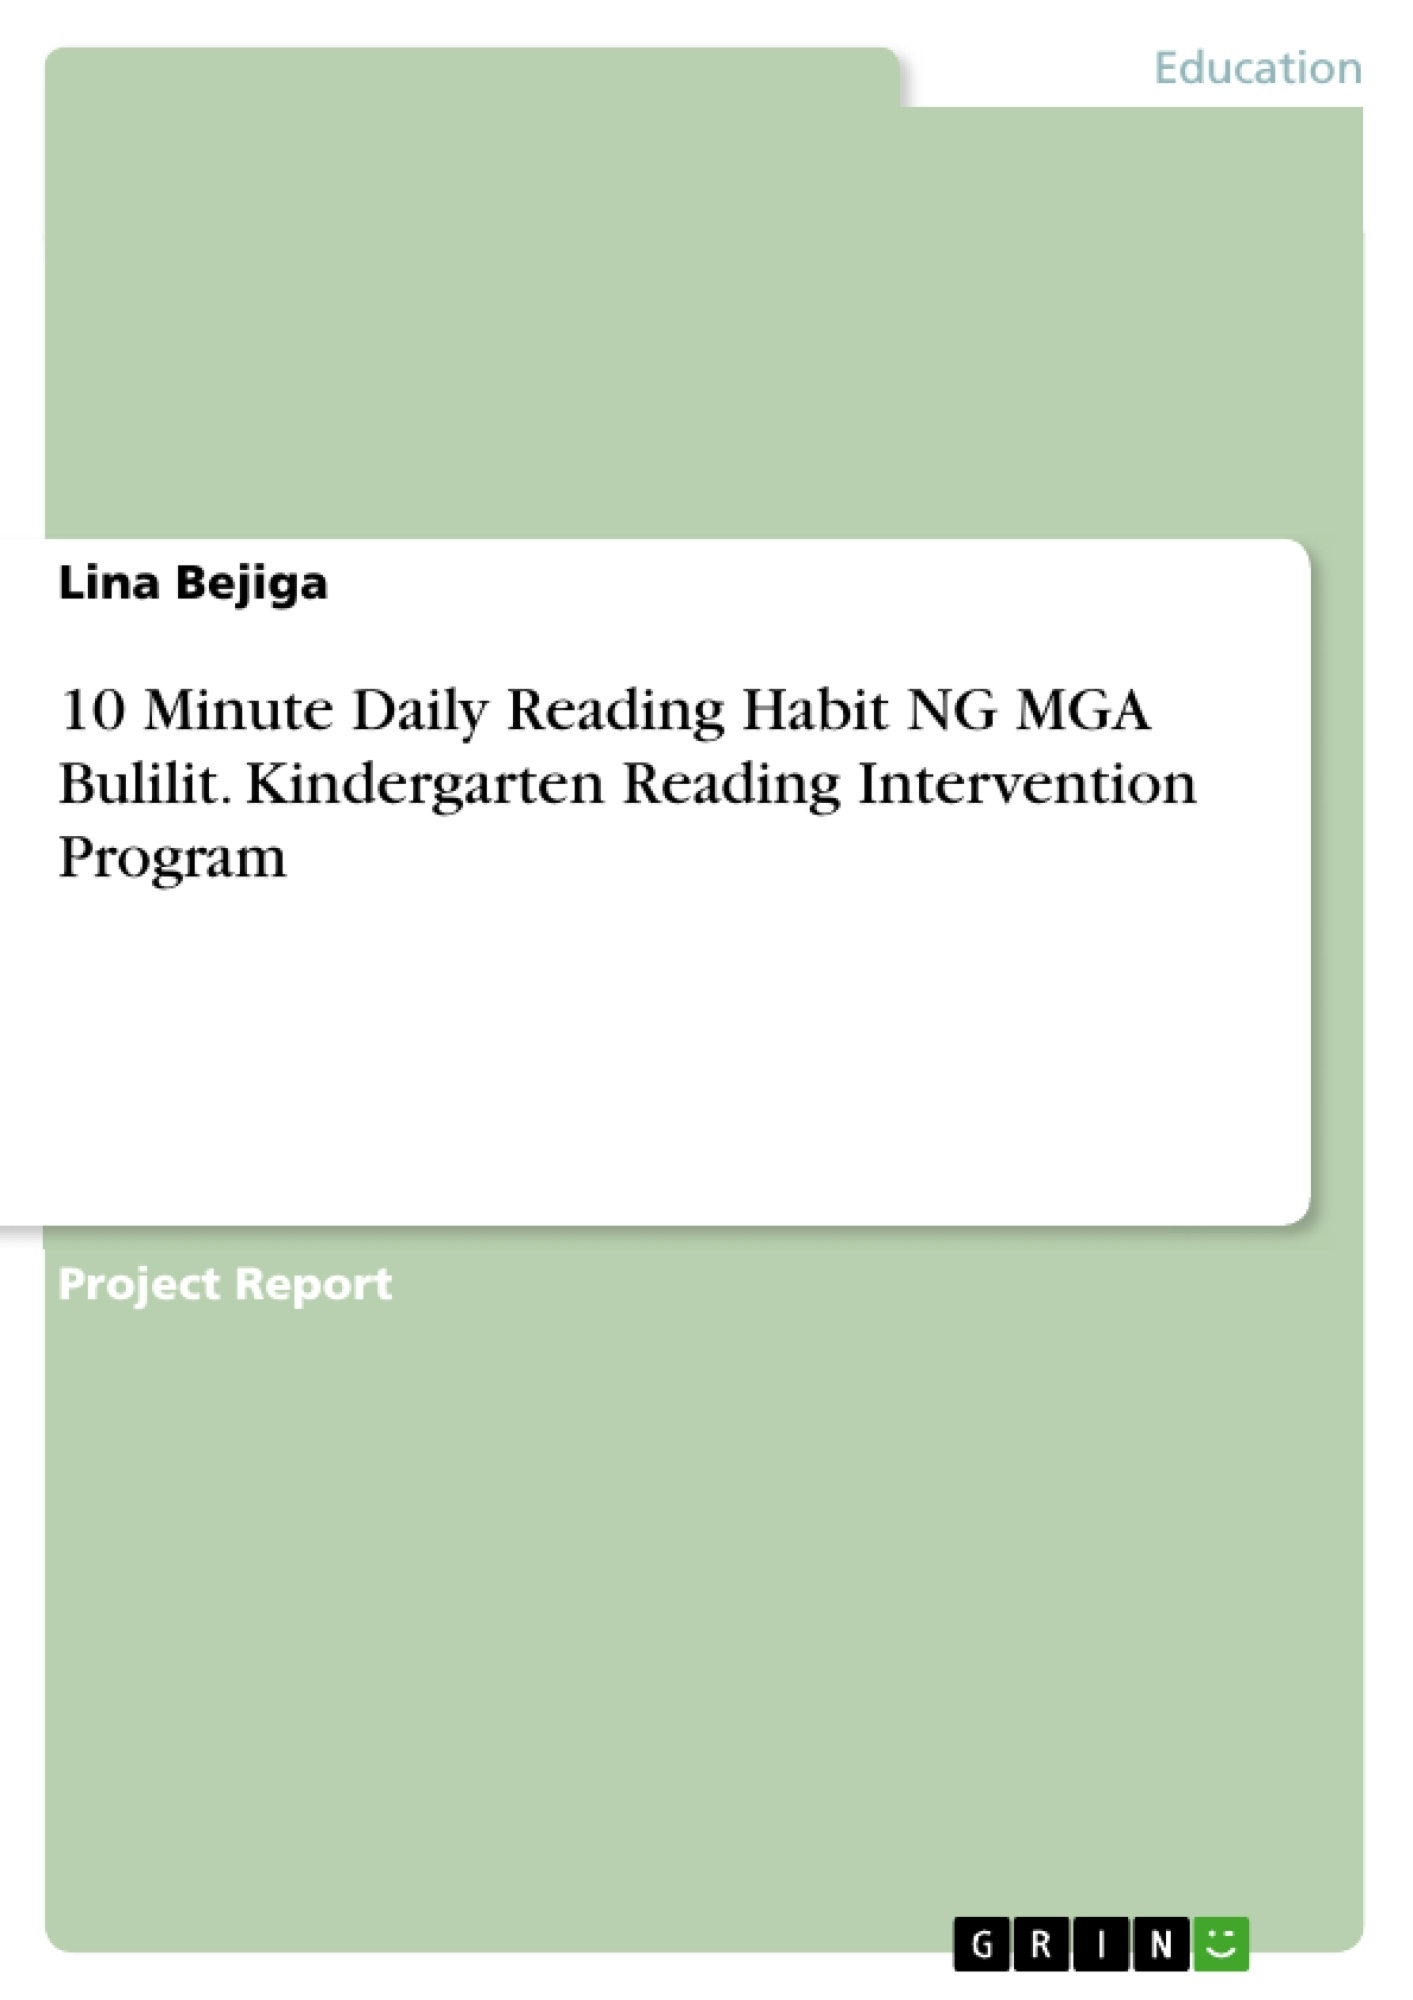 Title: 10 Minute Daily Reading Habit NG MGA Bulilit. Kindergarten Reading Intervention Program